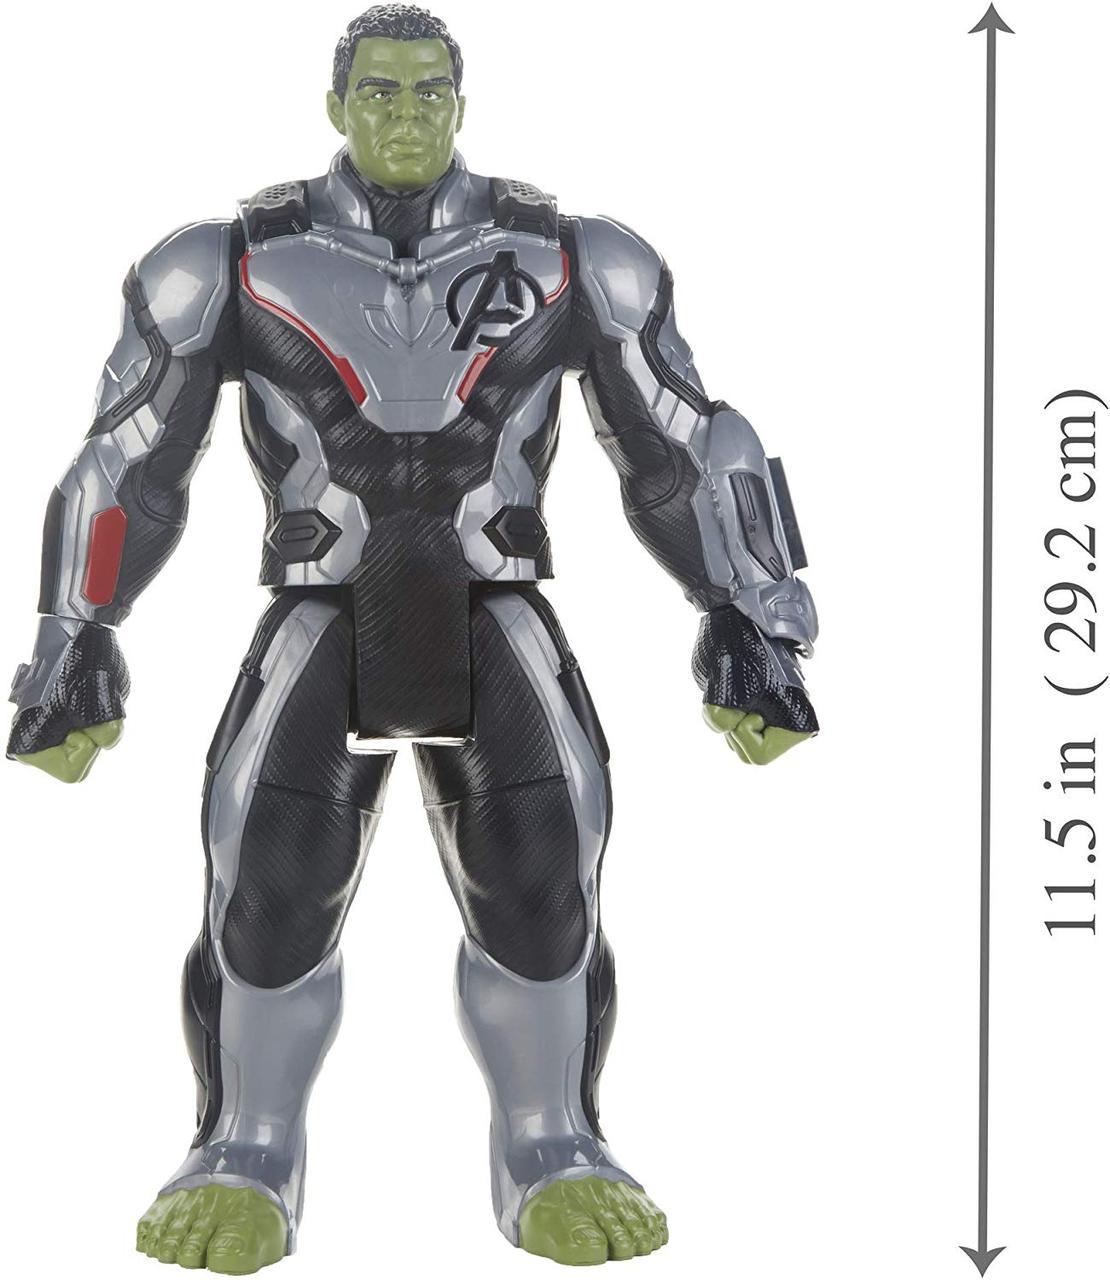 Фигурка ХАЛК серия Титаны, Avengers Marvel Endgame Titan Hero Hulk, Hasbro